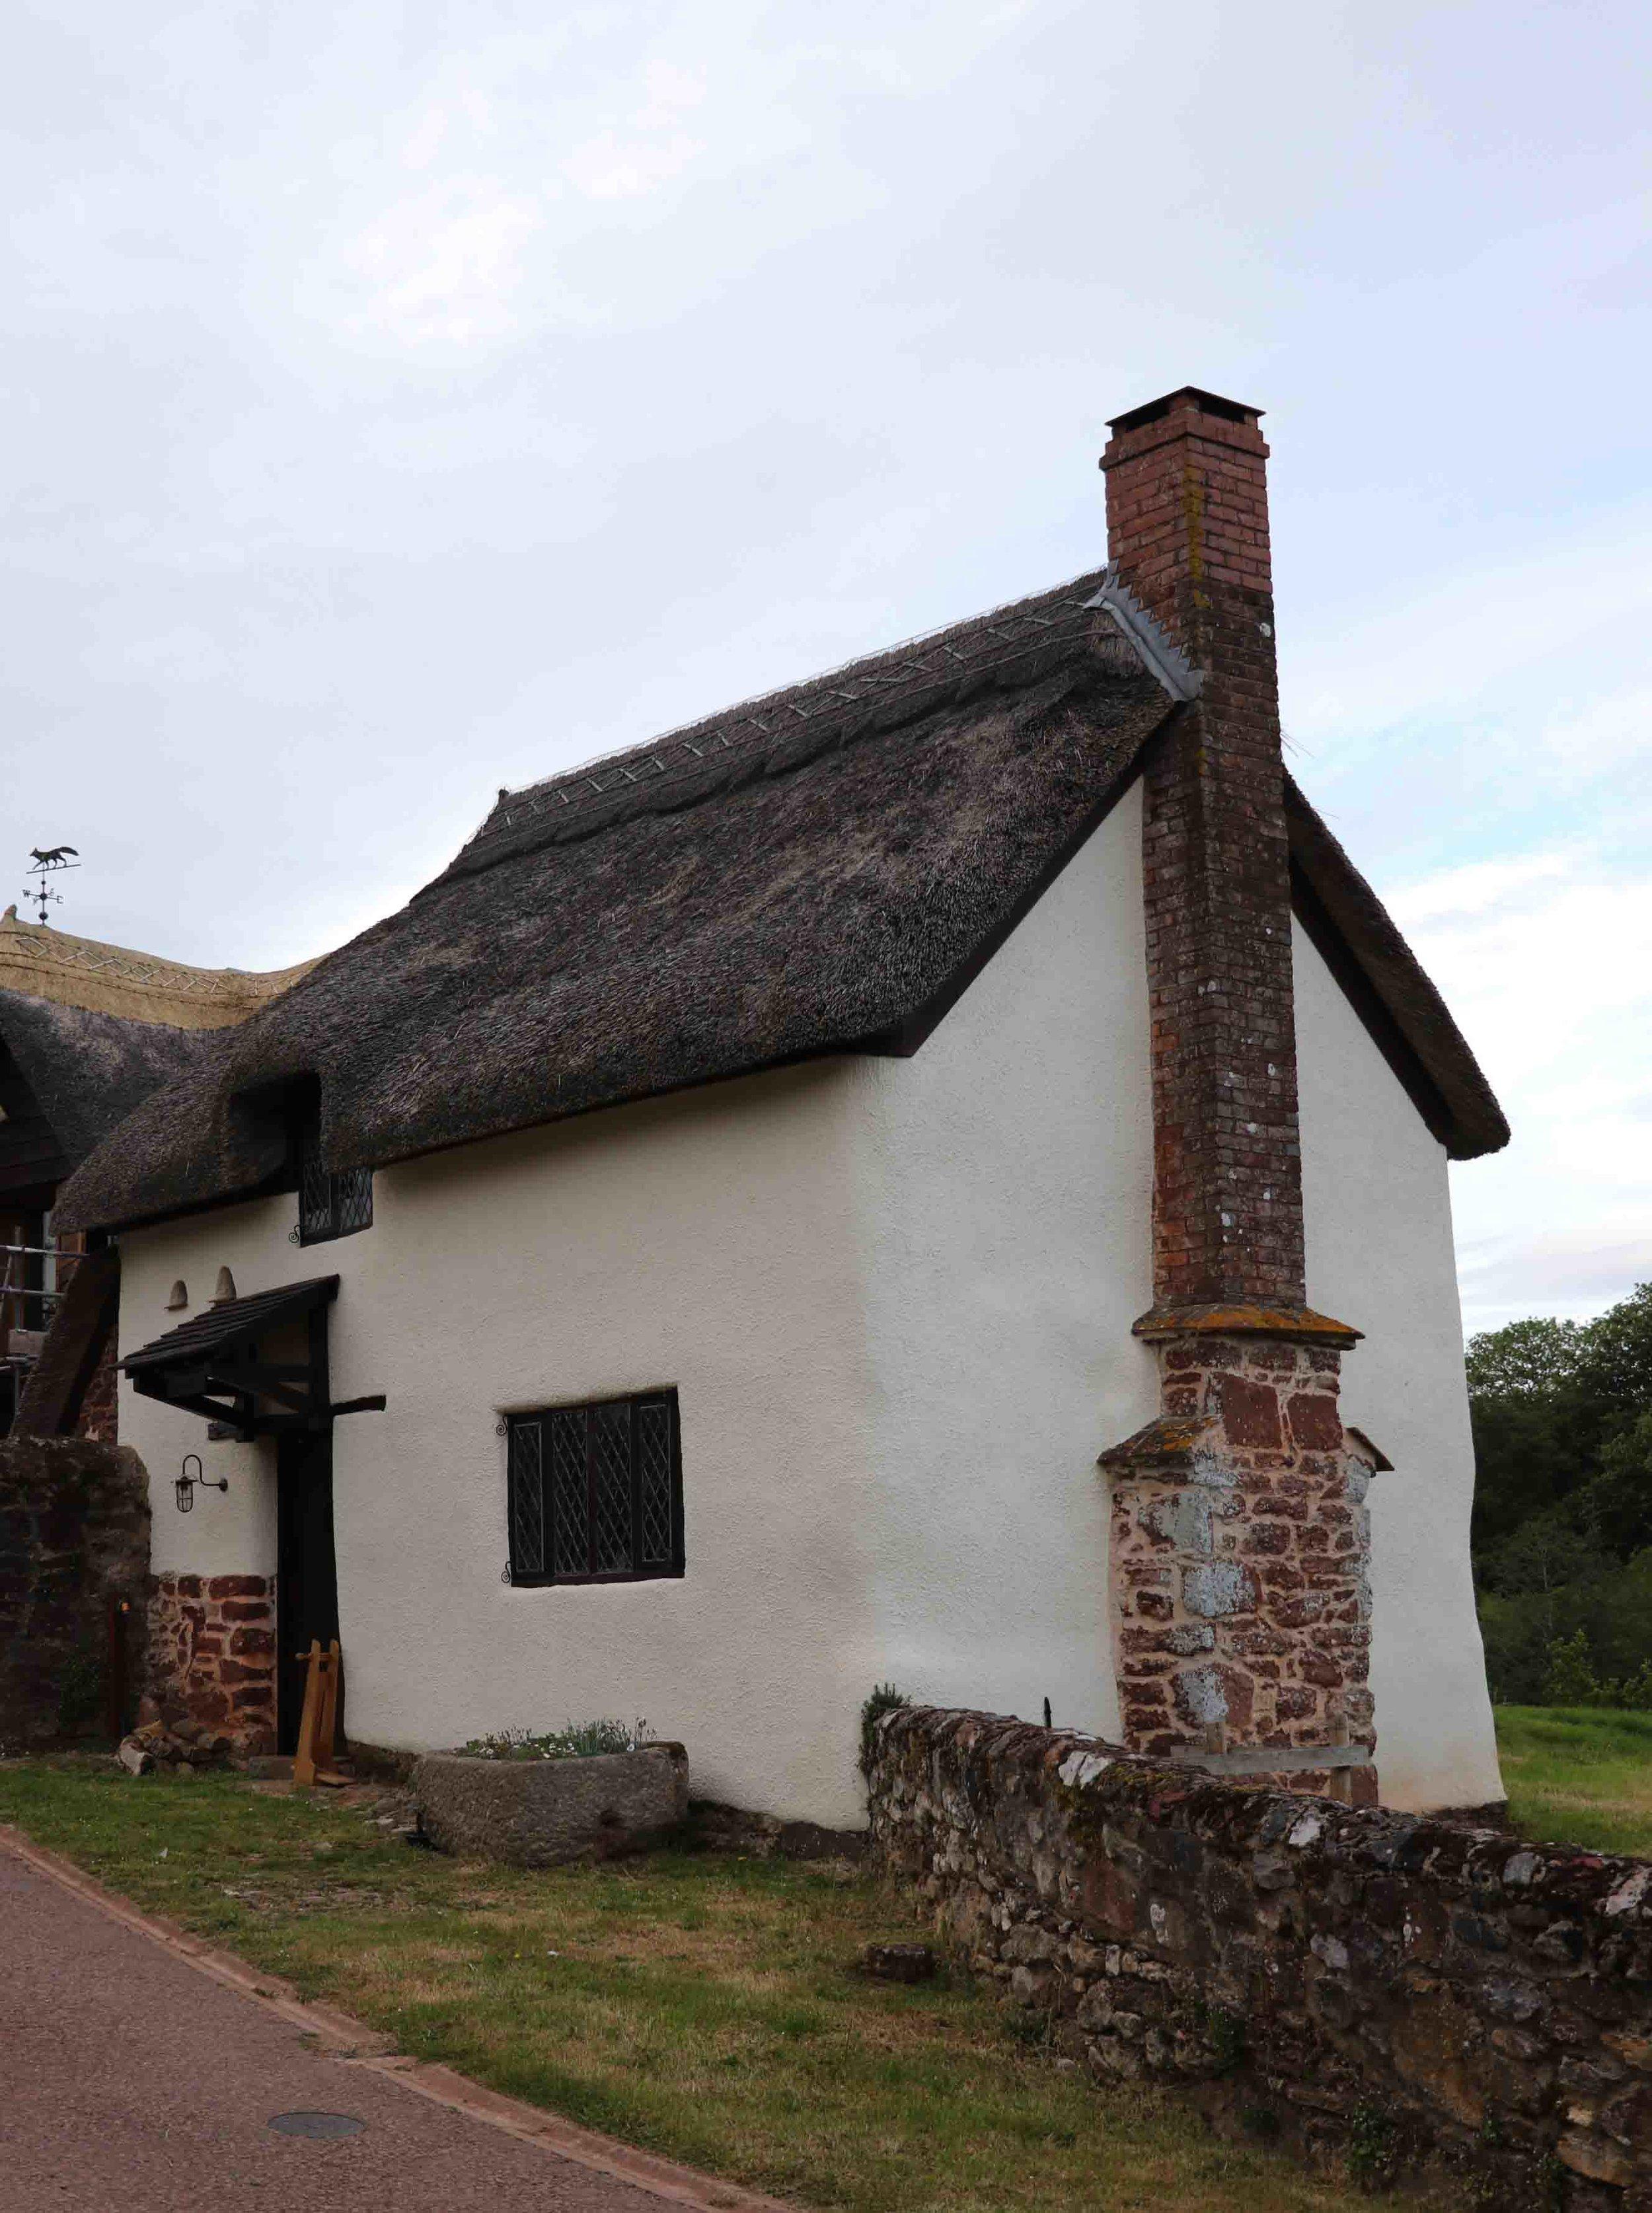 Fox Cottage at Tucketts Farm, Devon, GB.